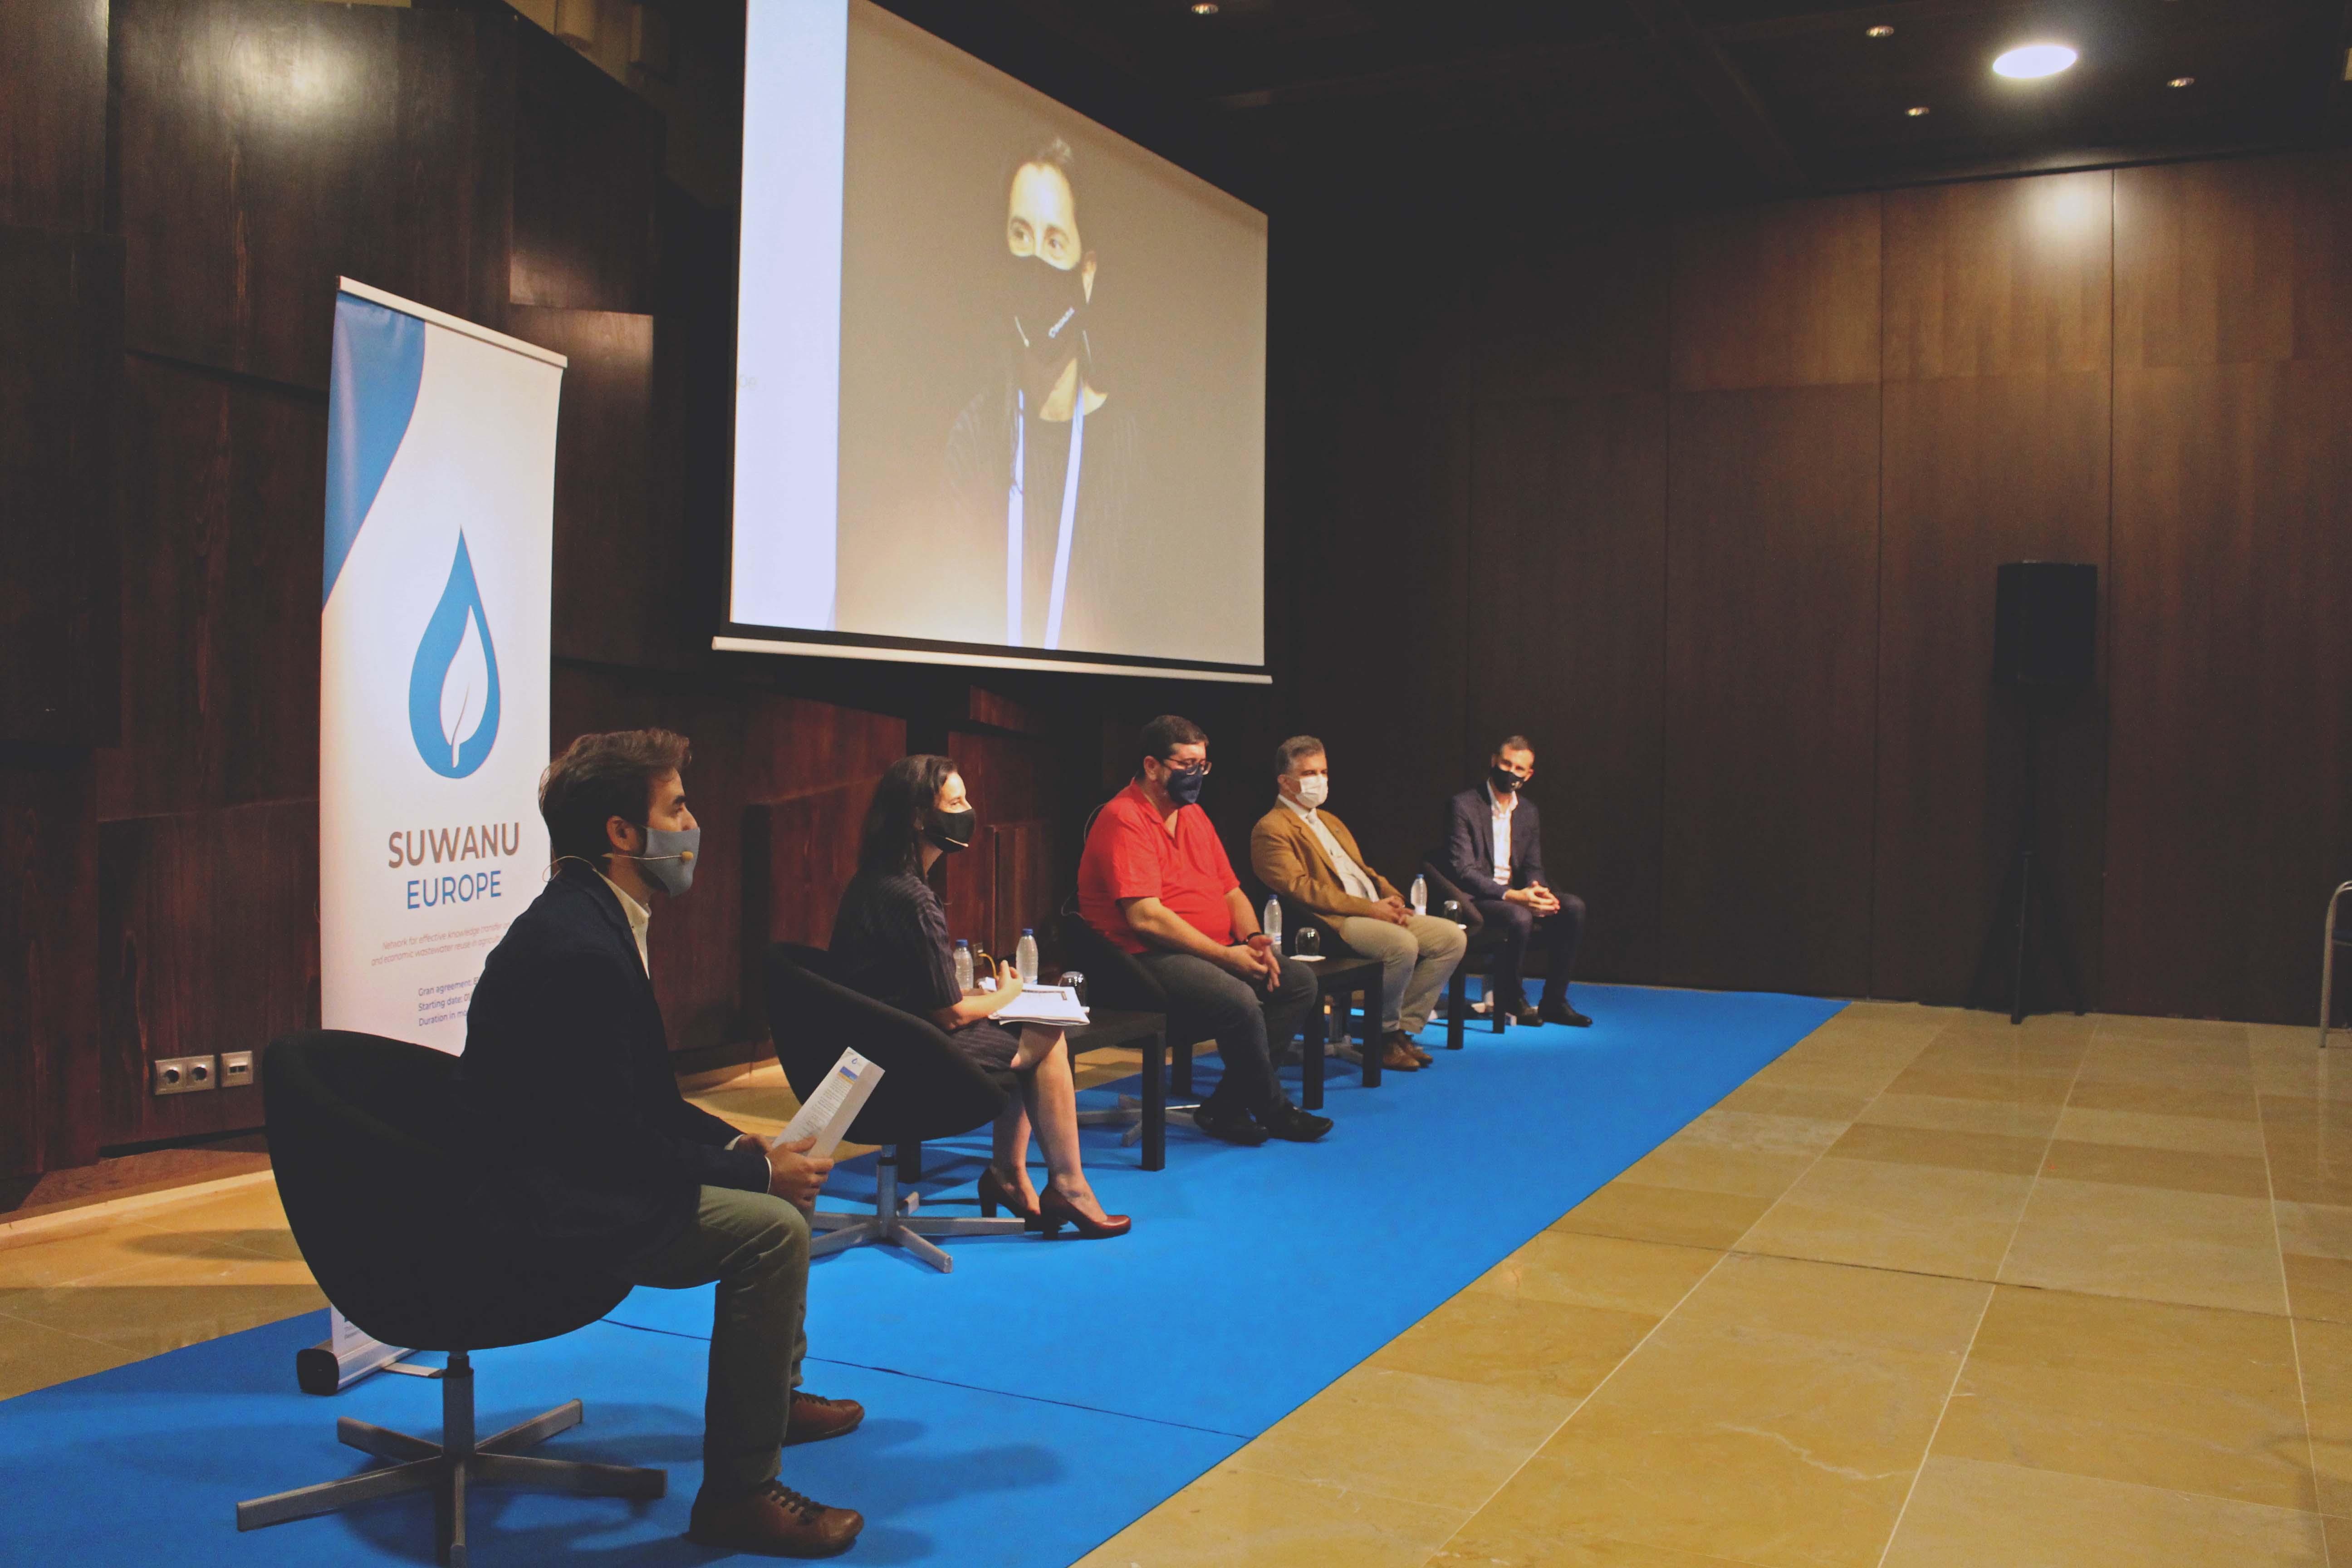 Opening table: Rafael Casielles (Bioazul), Antonia Lorenzo (Bioazul), Emilio Rodríguez (CHG), Ricardo Ruiz (Junta de Andalucía) and Alberto Pérez (Ayto. Algarrobo)